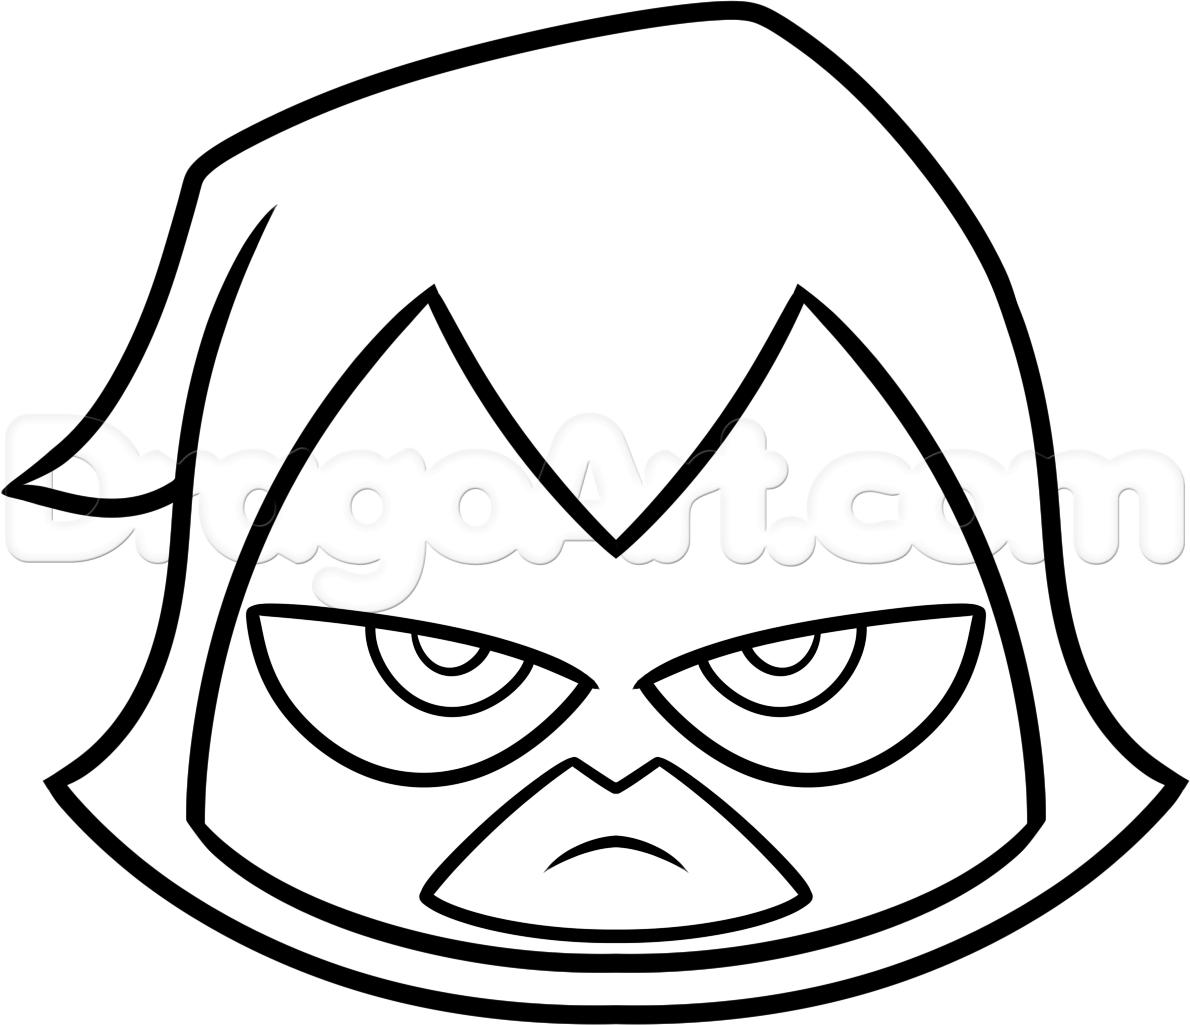 1190x1025 Cartoon Network Drawings